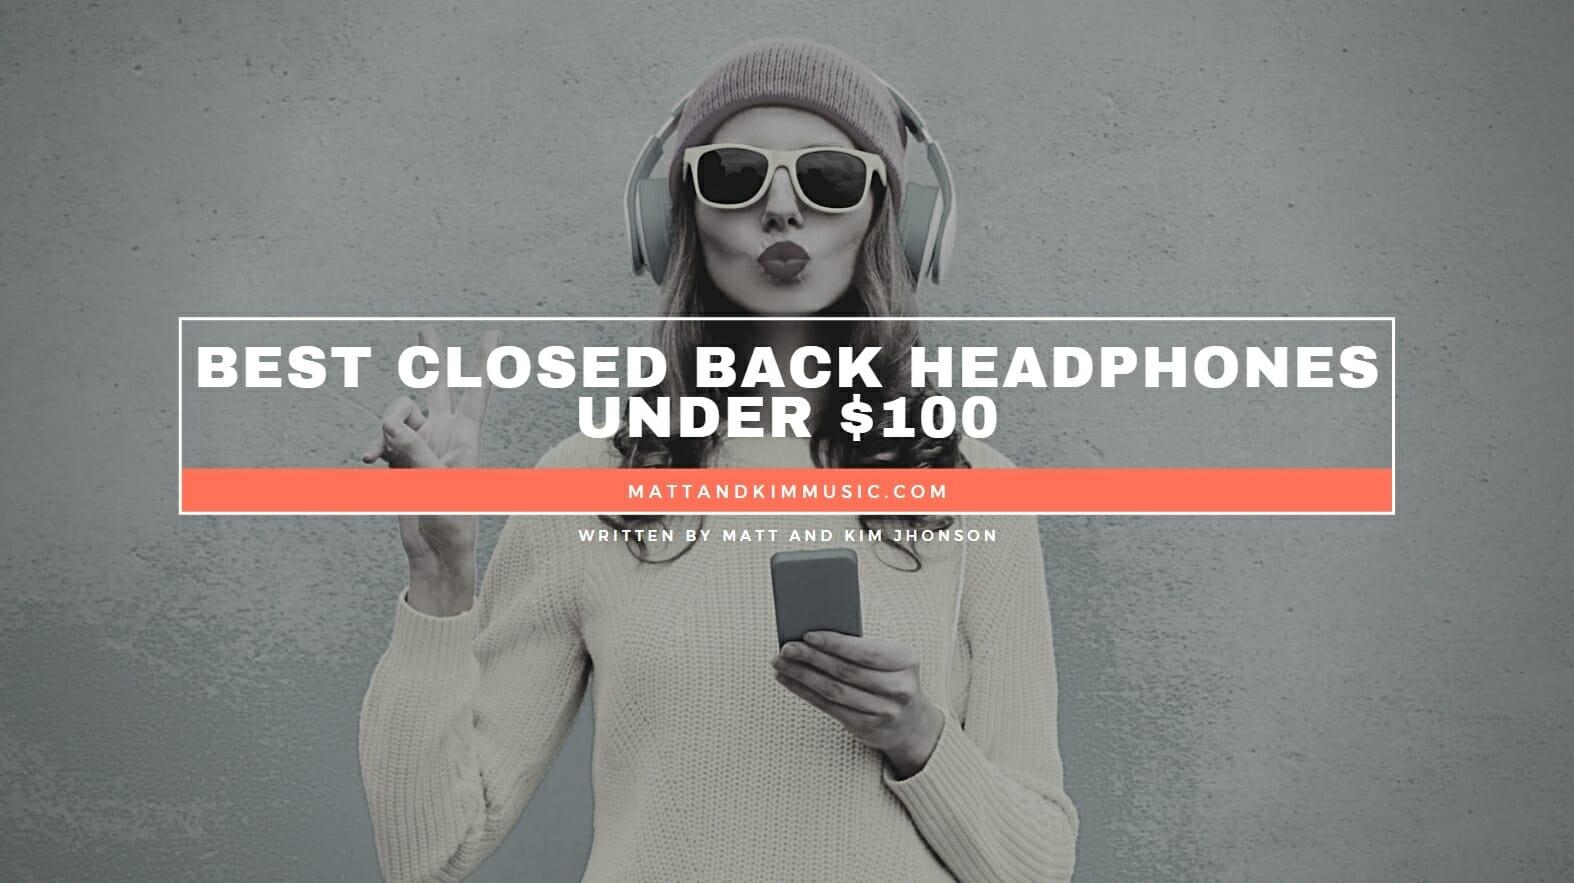 Best Closed Back Headphones Under $100